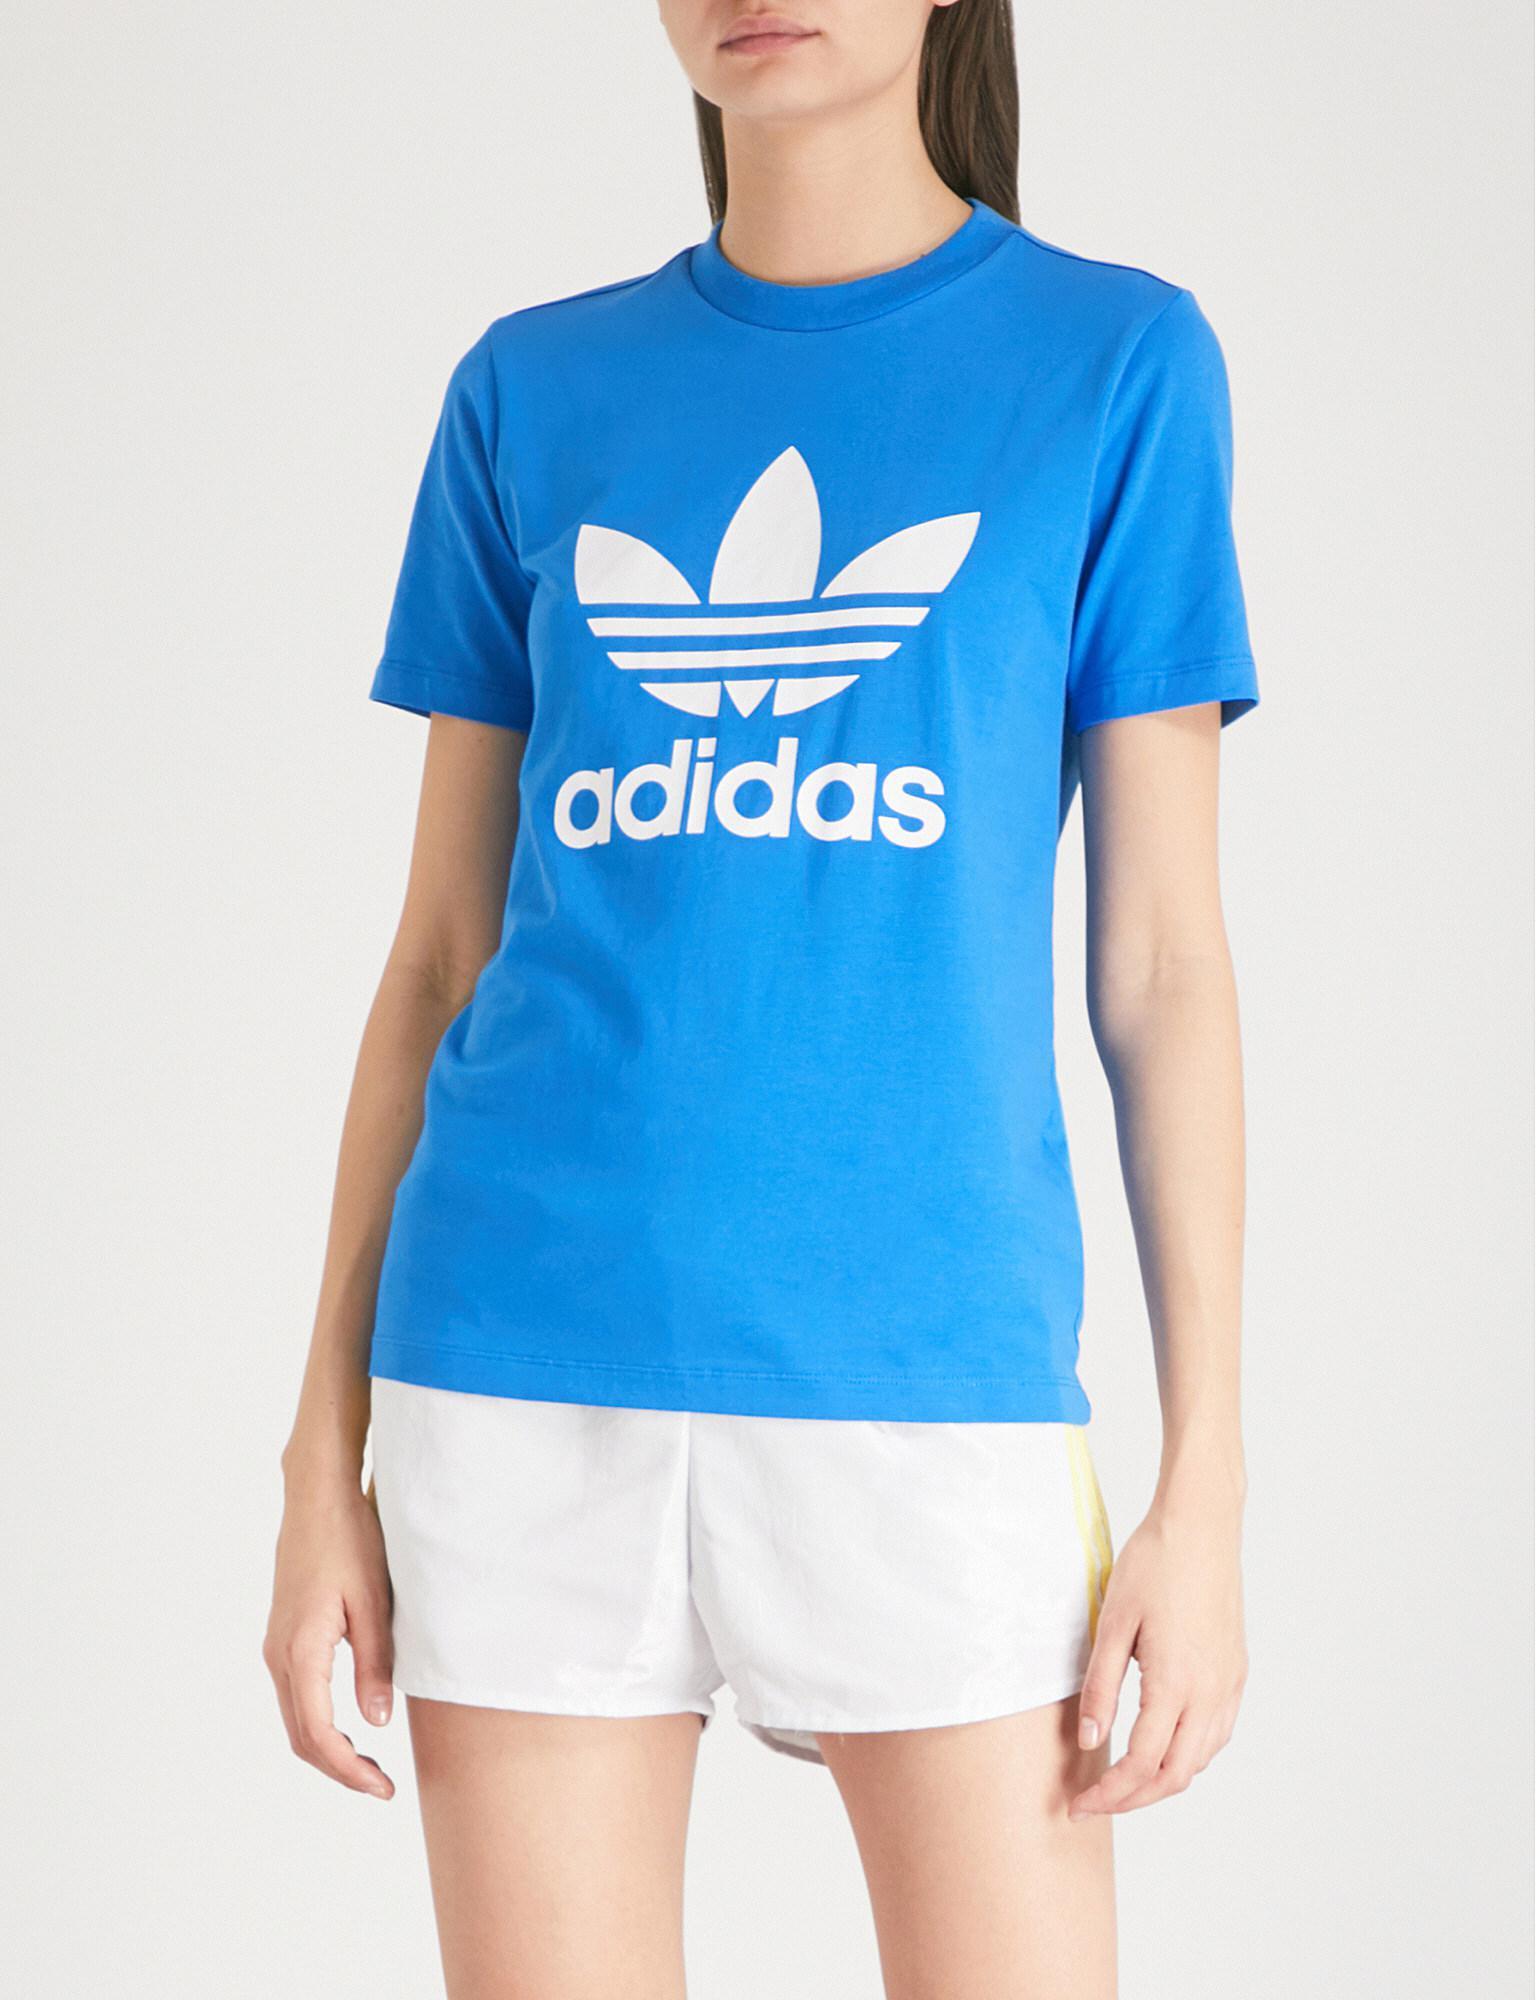 Http Store 34qet11fhtml Heartofflavourco Tendencies Tshirt Neon Cross Hitam L Adidas Originals Bluebird Trefoil Stretch Jersey T Shirtjpeg